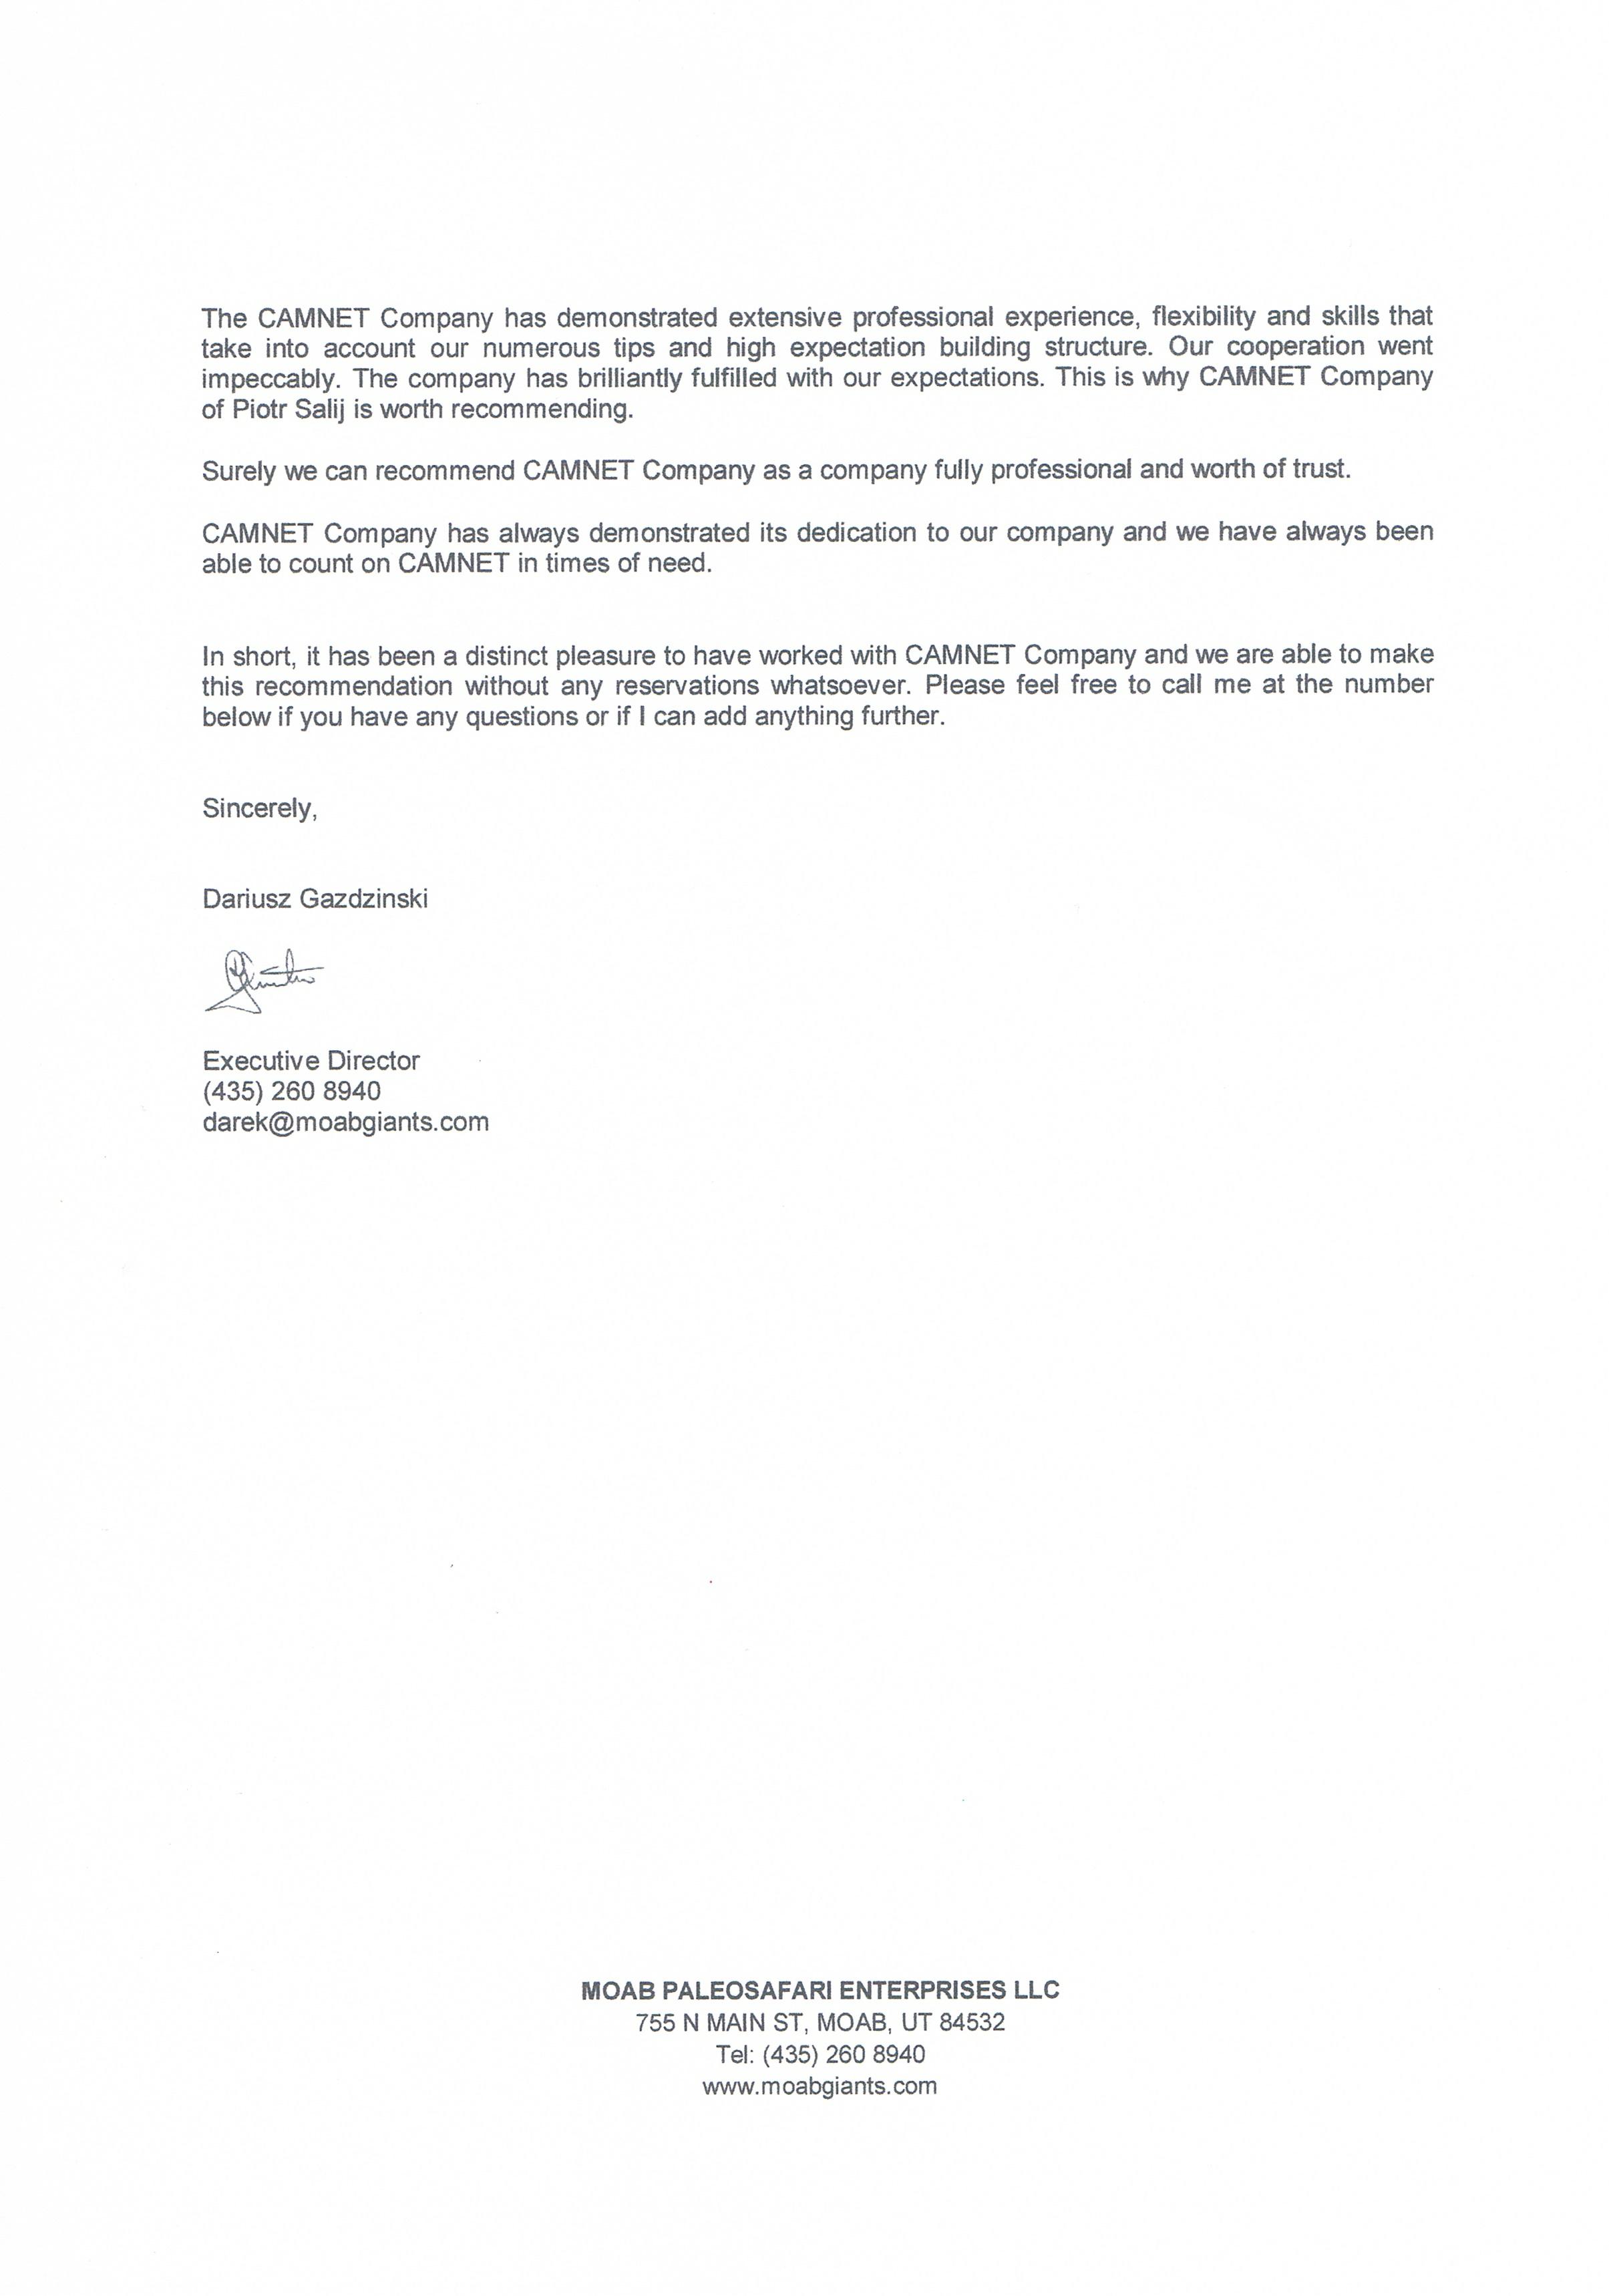 MOAB PALEOSAFARI ENTERPRISES LLC, USA, page 2